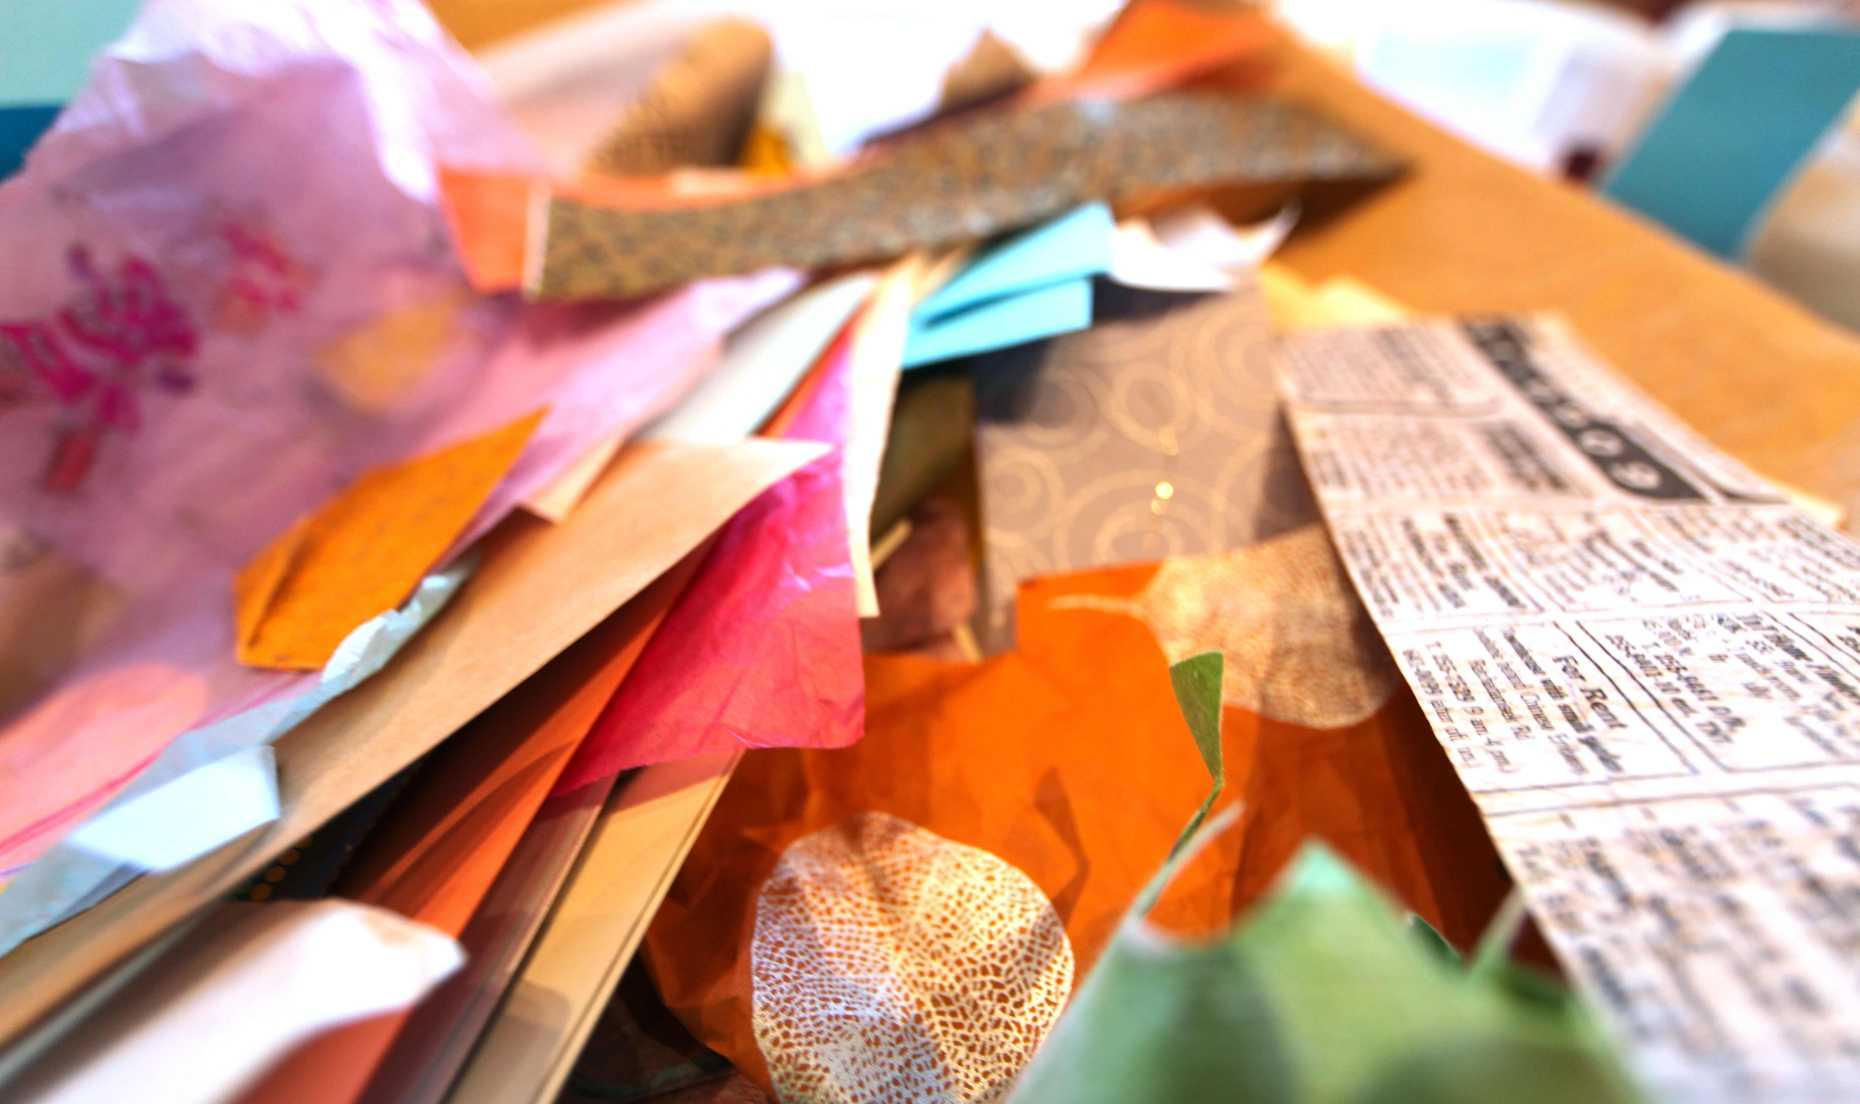 Scraps of Paper. All You Need to Make an Original Valentine. Photo © Liesl Clark